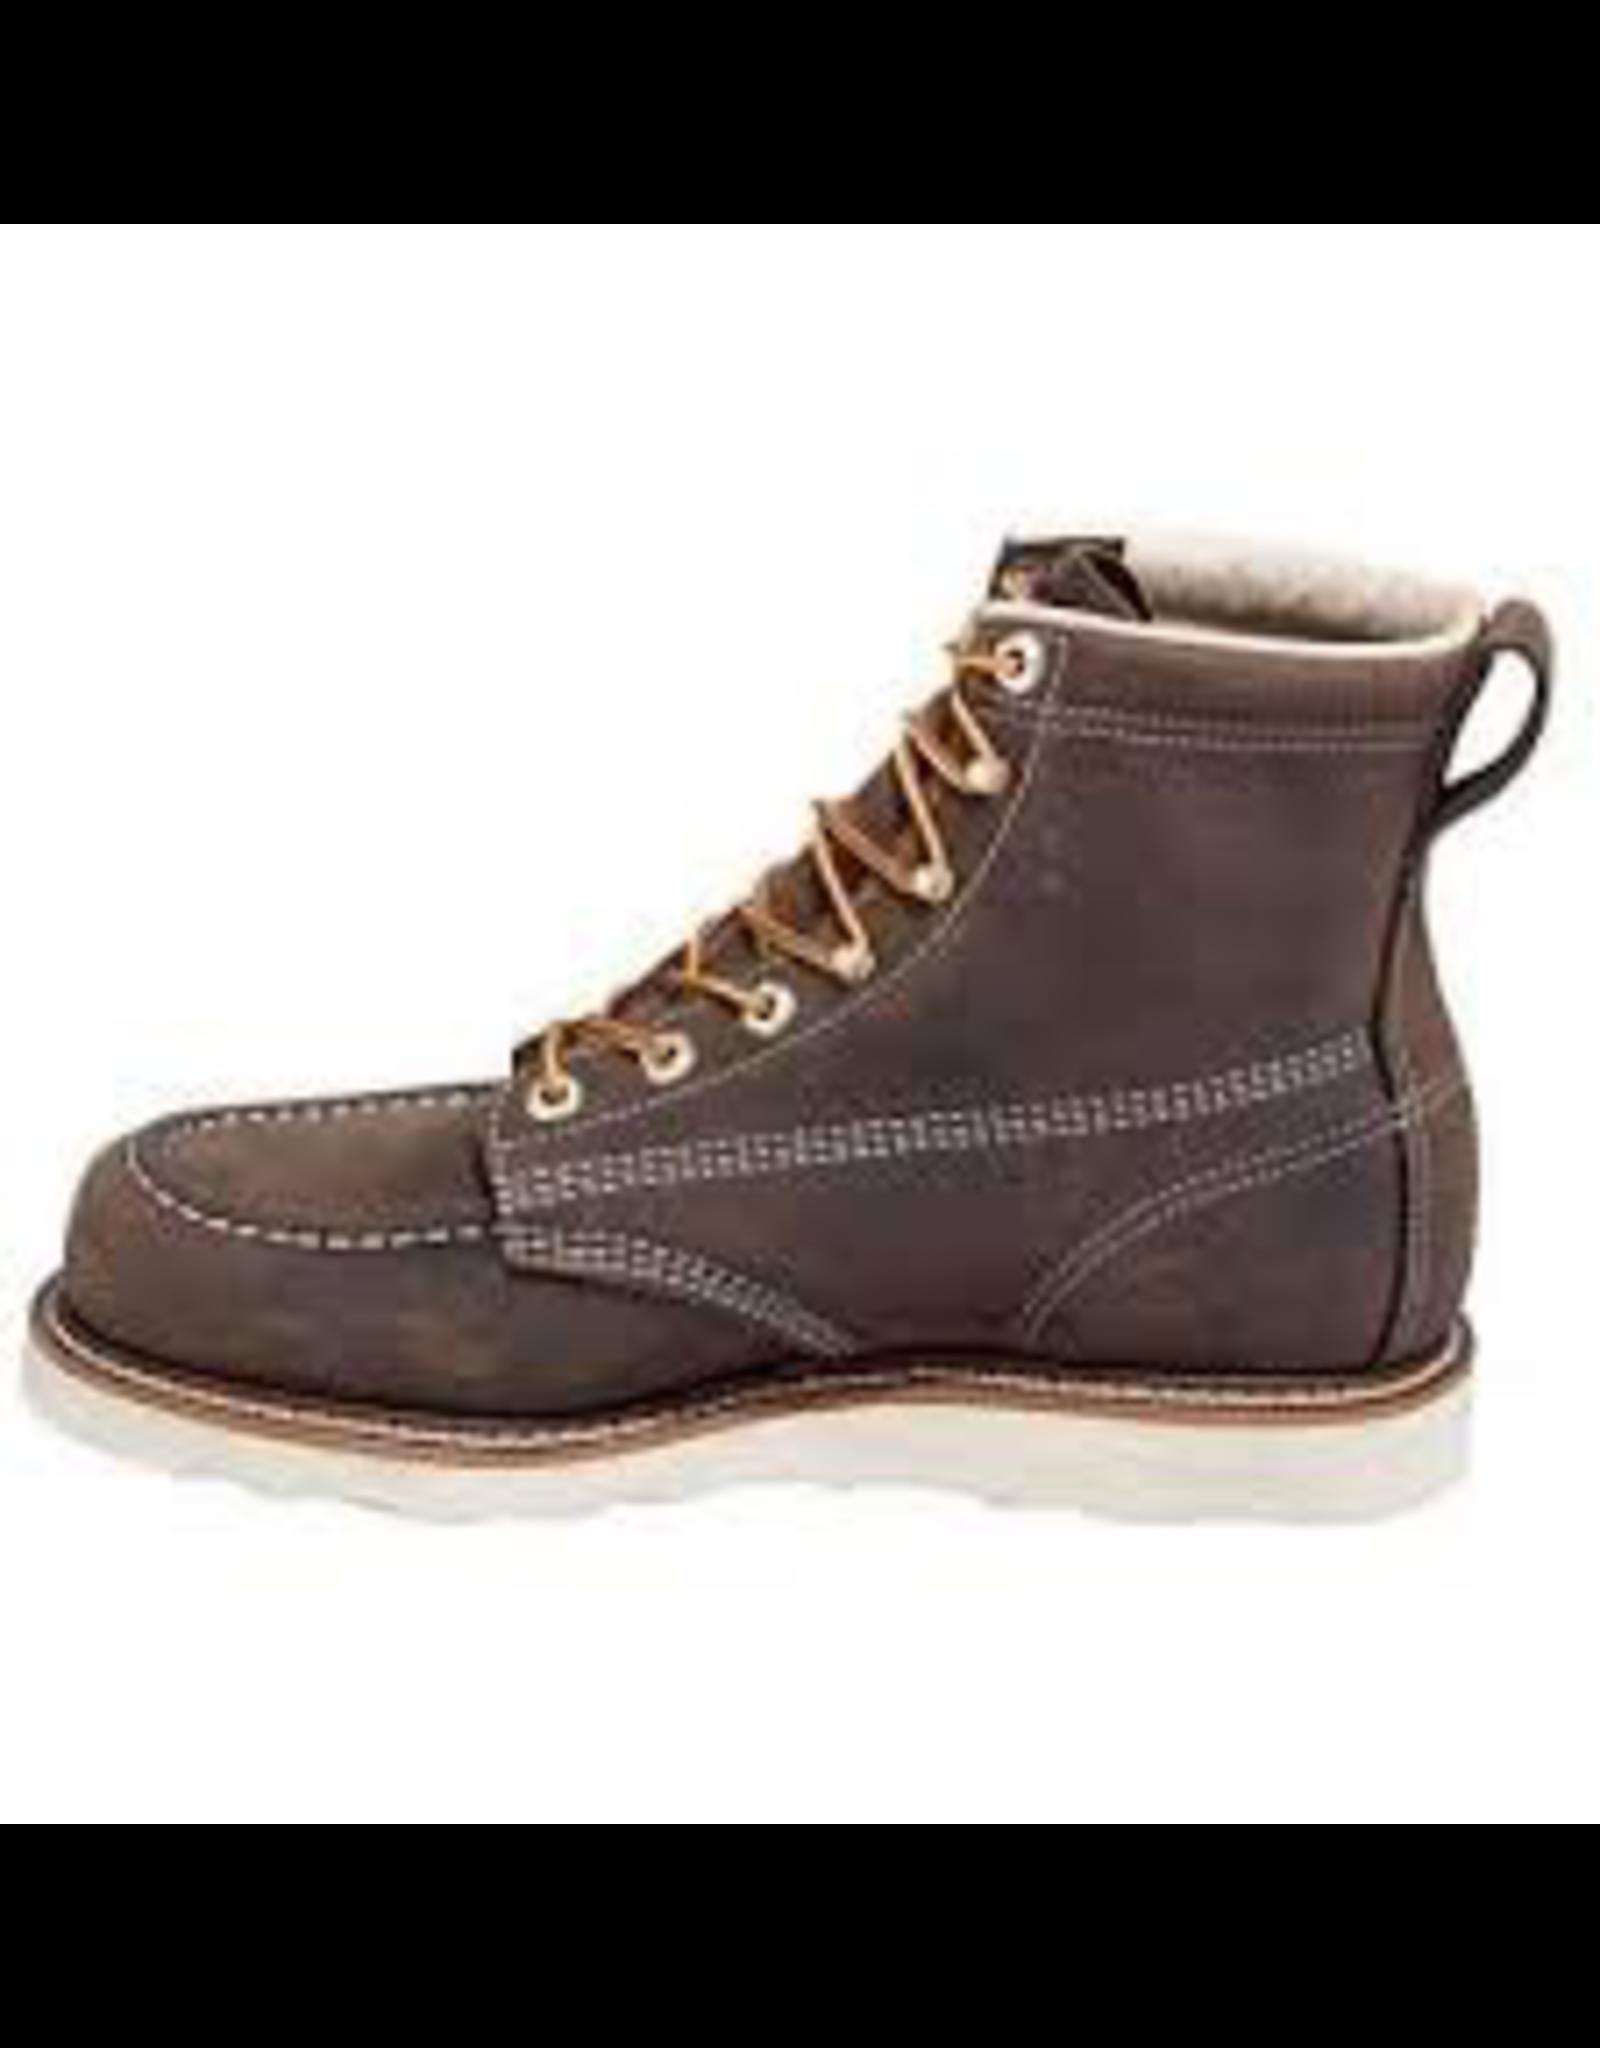 Boots-Men Thorogood 814-4203 6in Soft Moc Toe